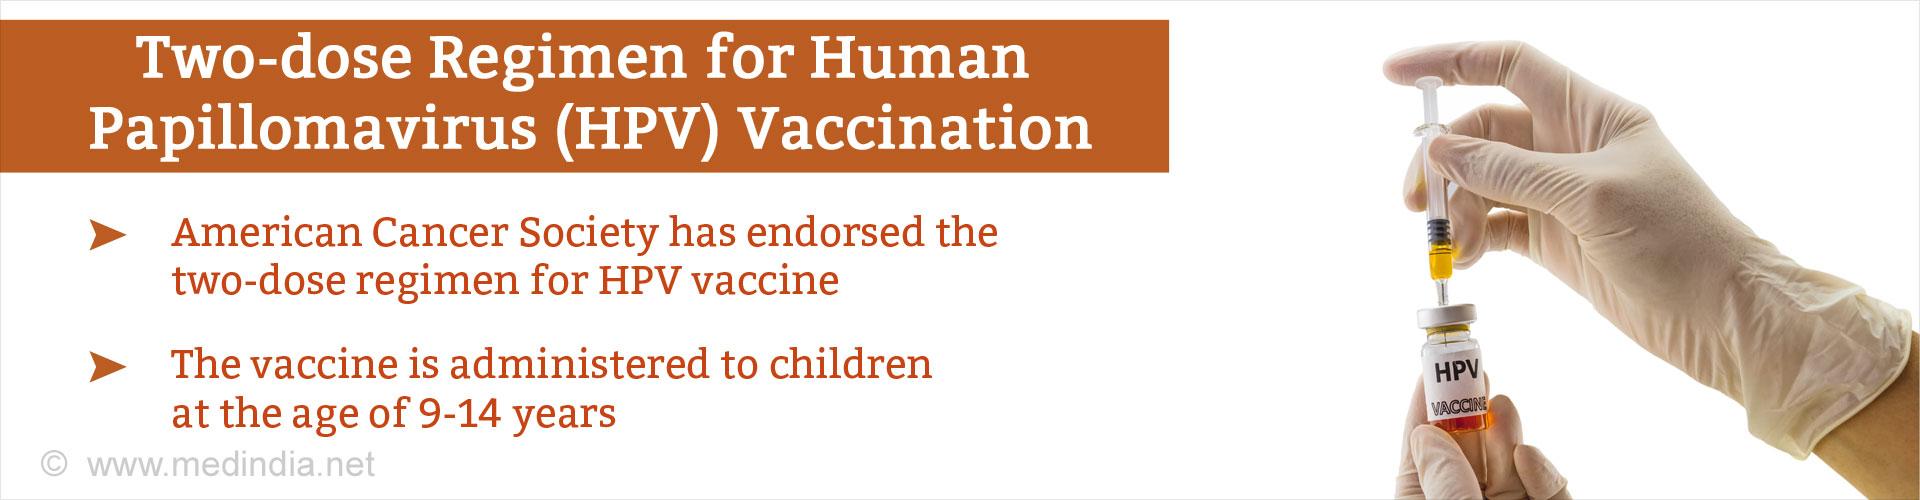 Endorsing Two-Dose Regimen for Human Papillomavirus (HPV) Vaccination